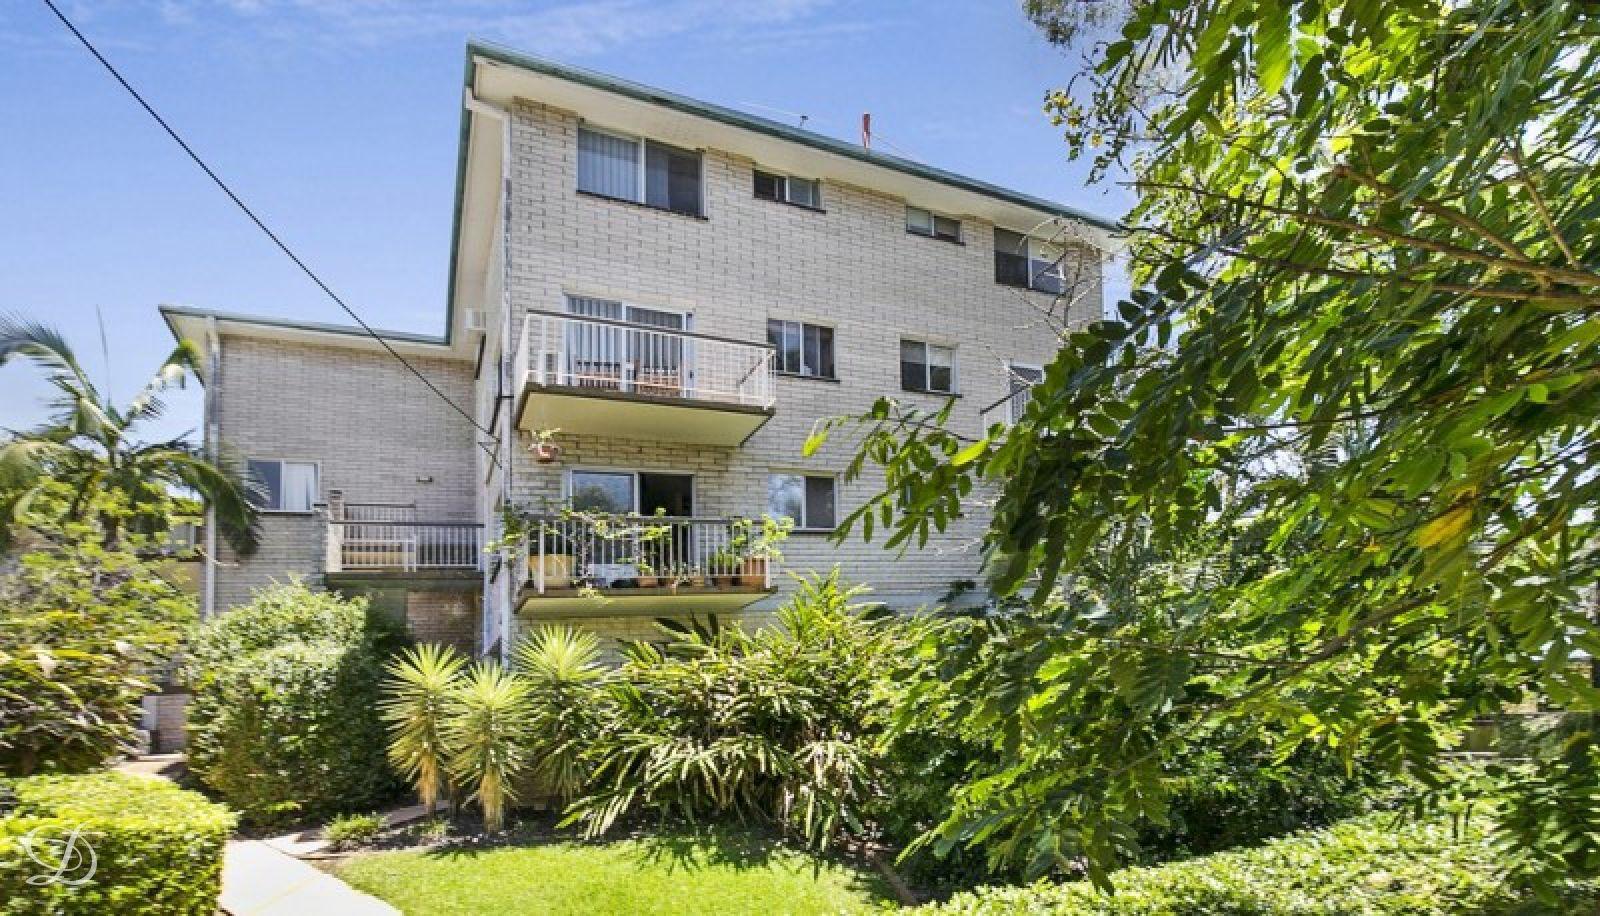 9/20 Franklin Street, Kelvin Grove QLD 4059, Image 0